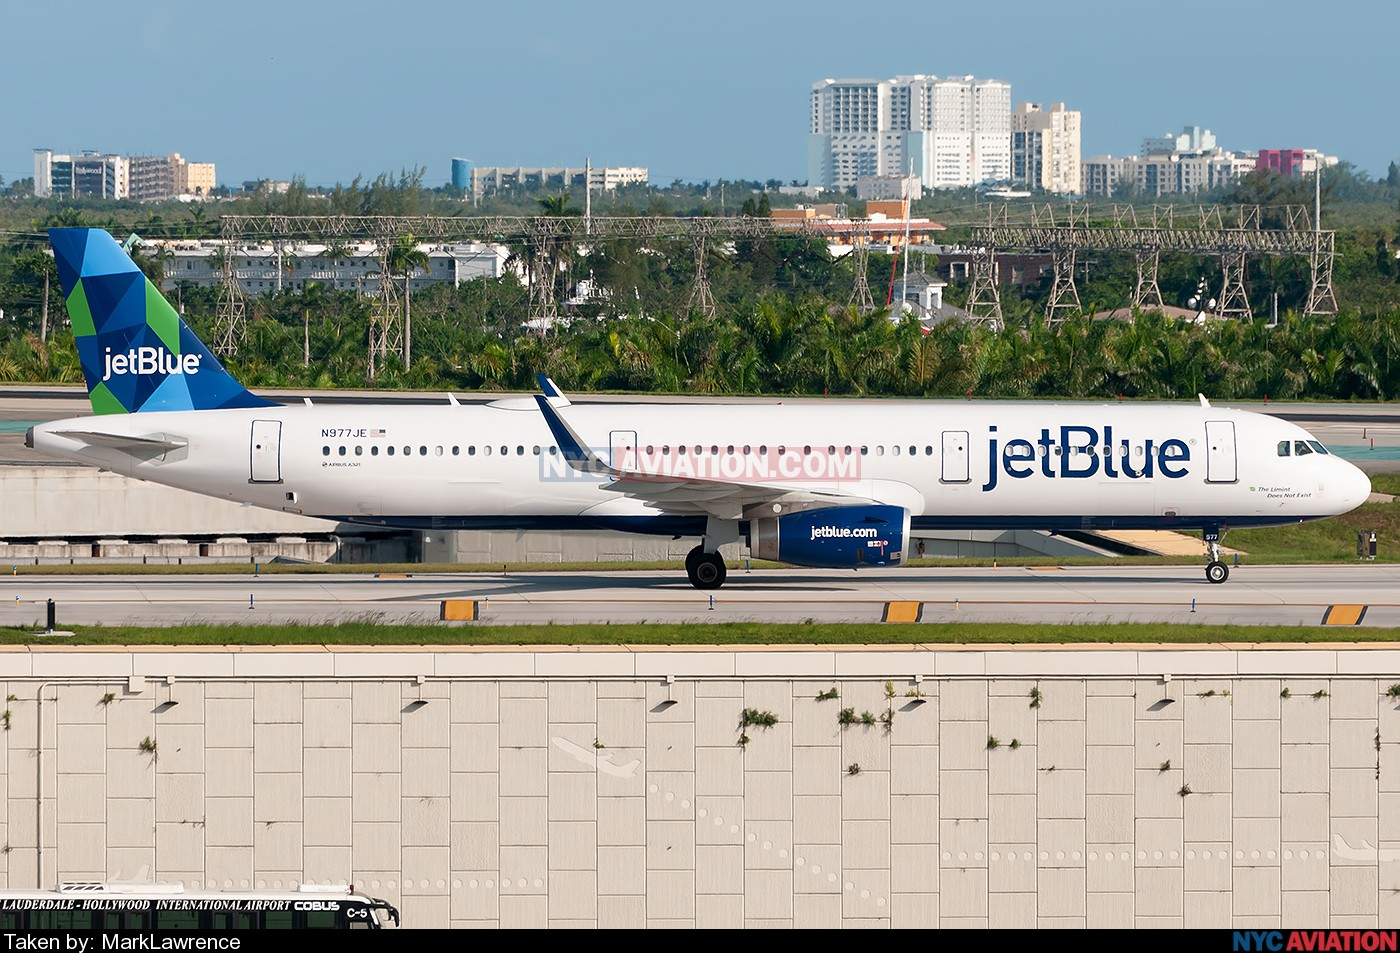 xUdIdQMuqz-A321-N977JE-KFLL-07292019.jpg